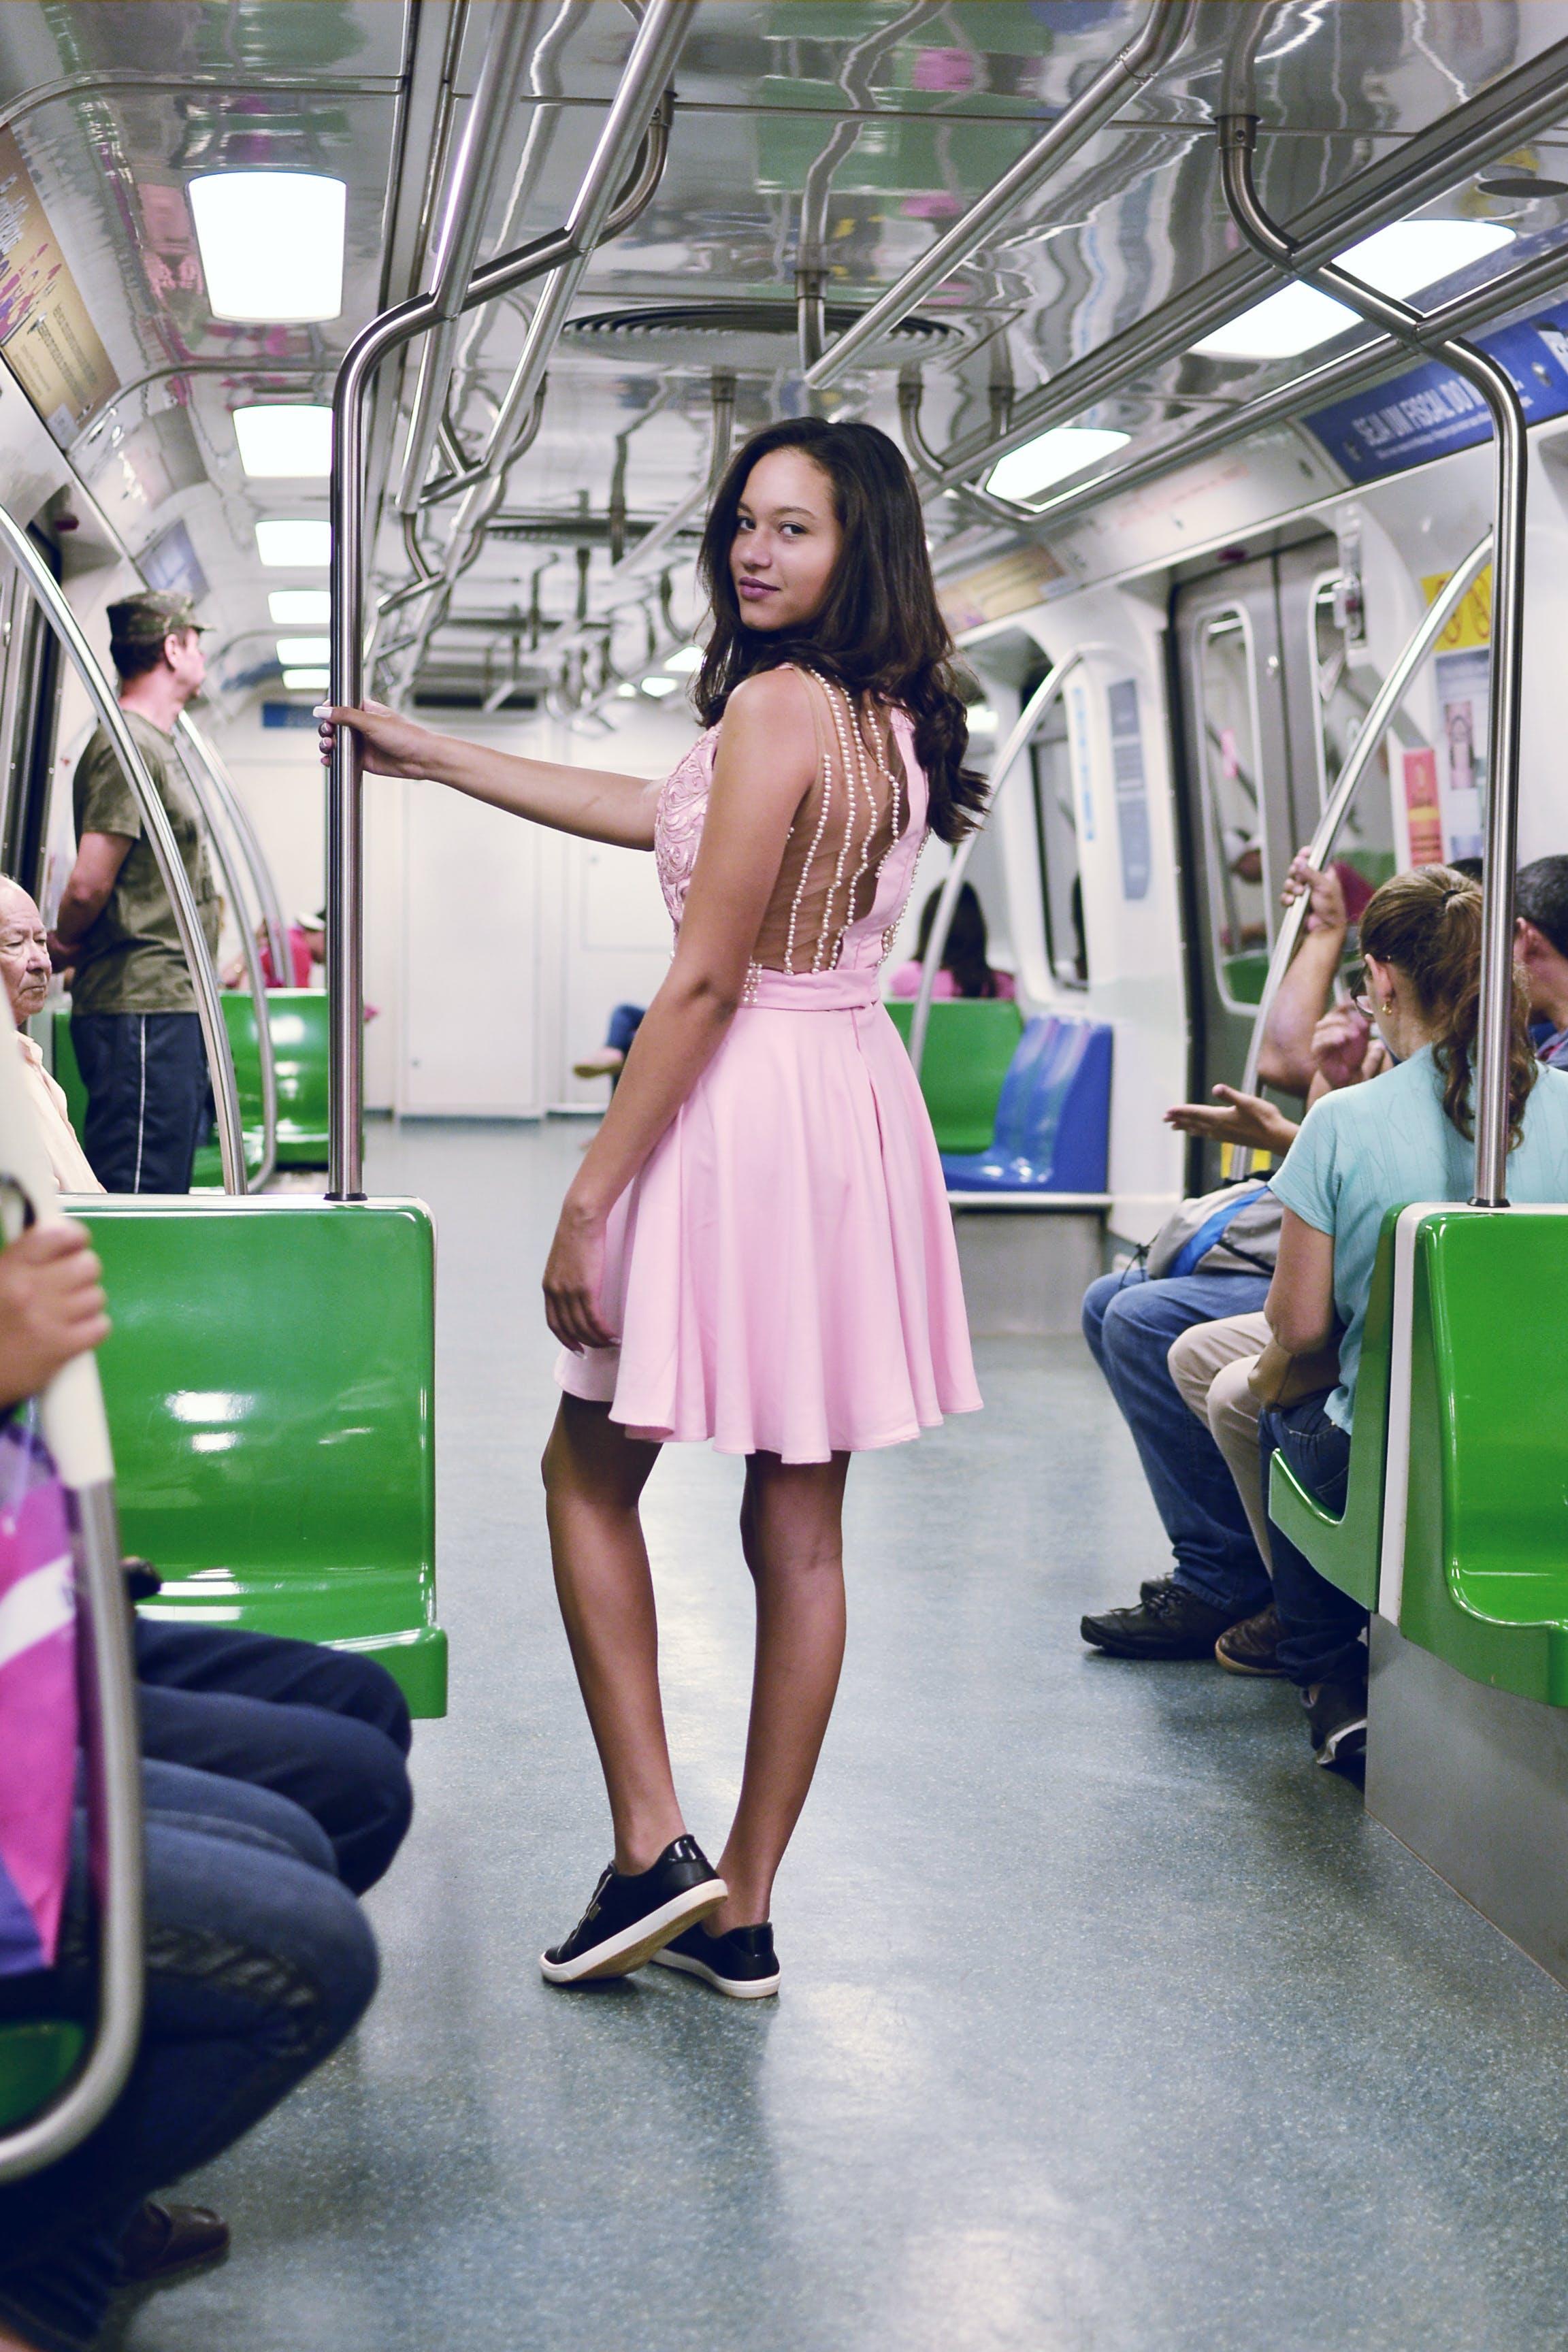 Woman Wearing Pink Sleeveless Dress Inside the Train